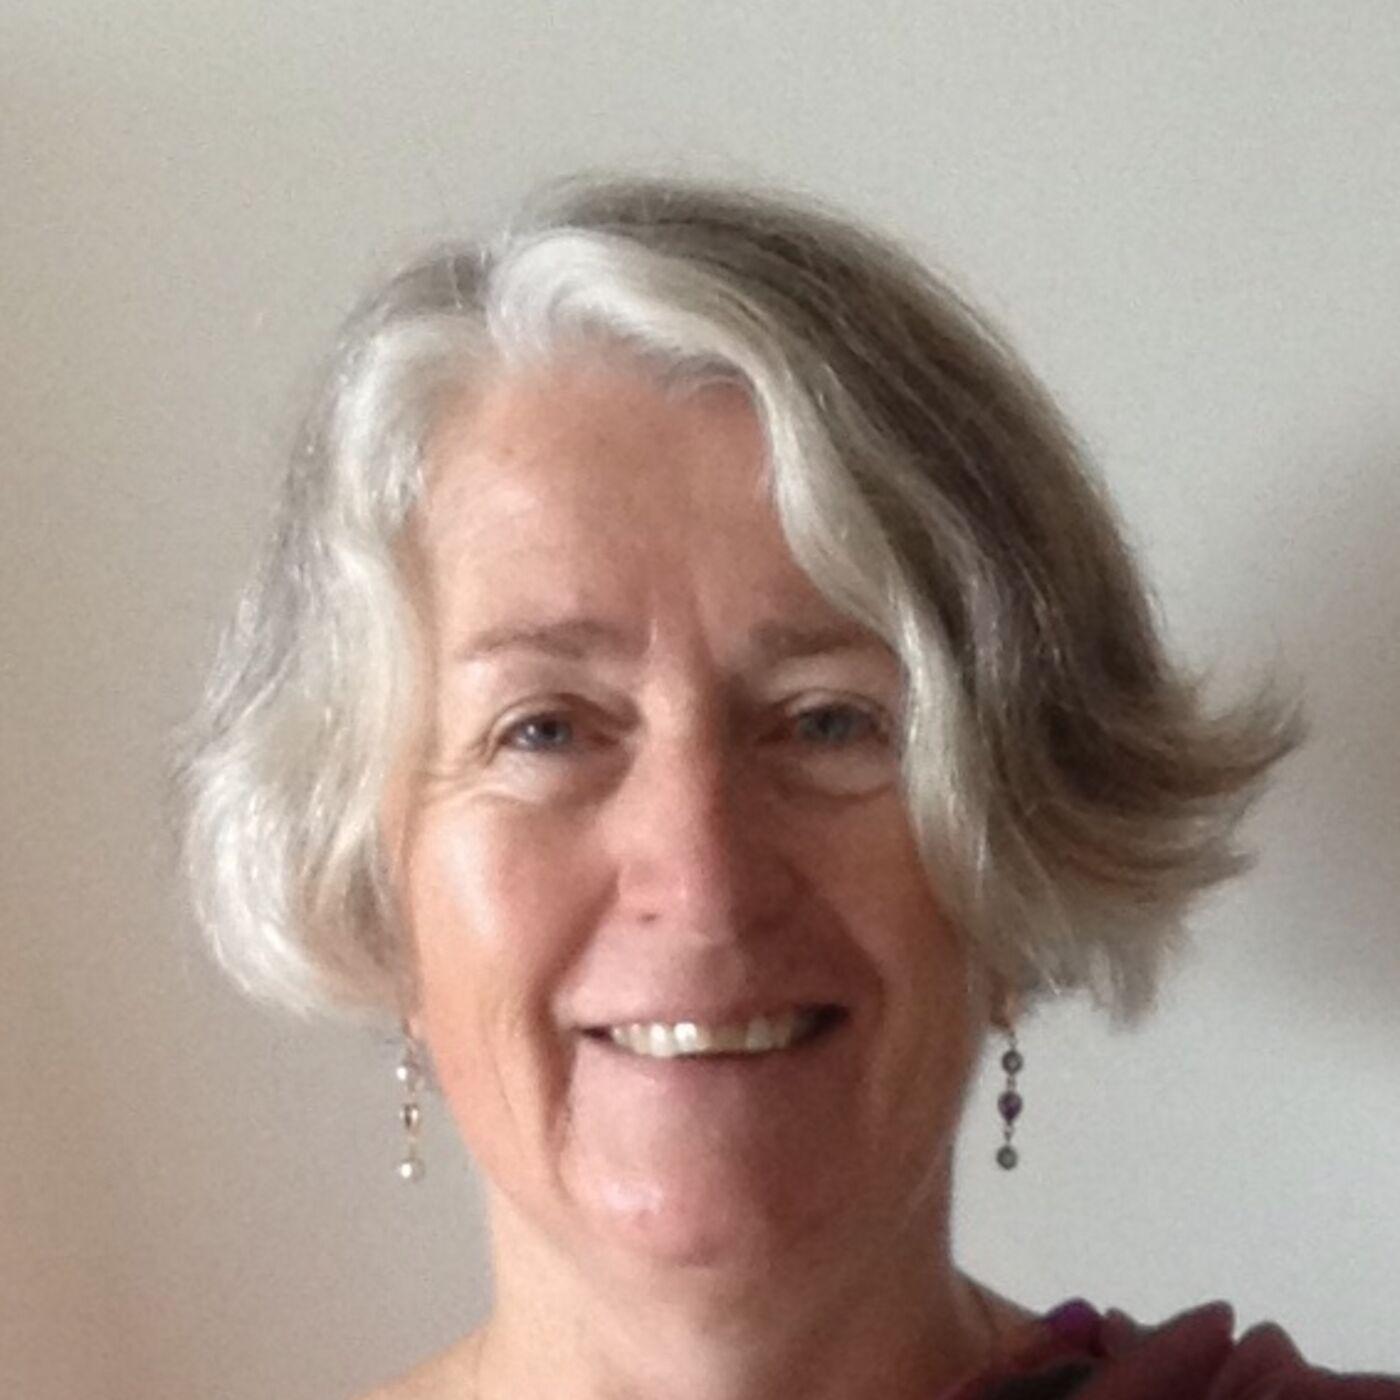 Episode 7: Interview with Mariane Judd, PhD